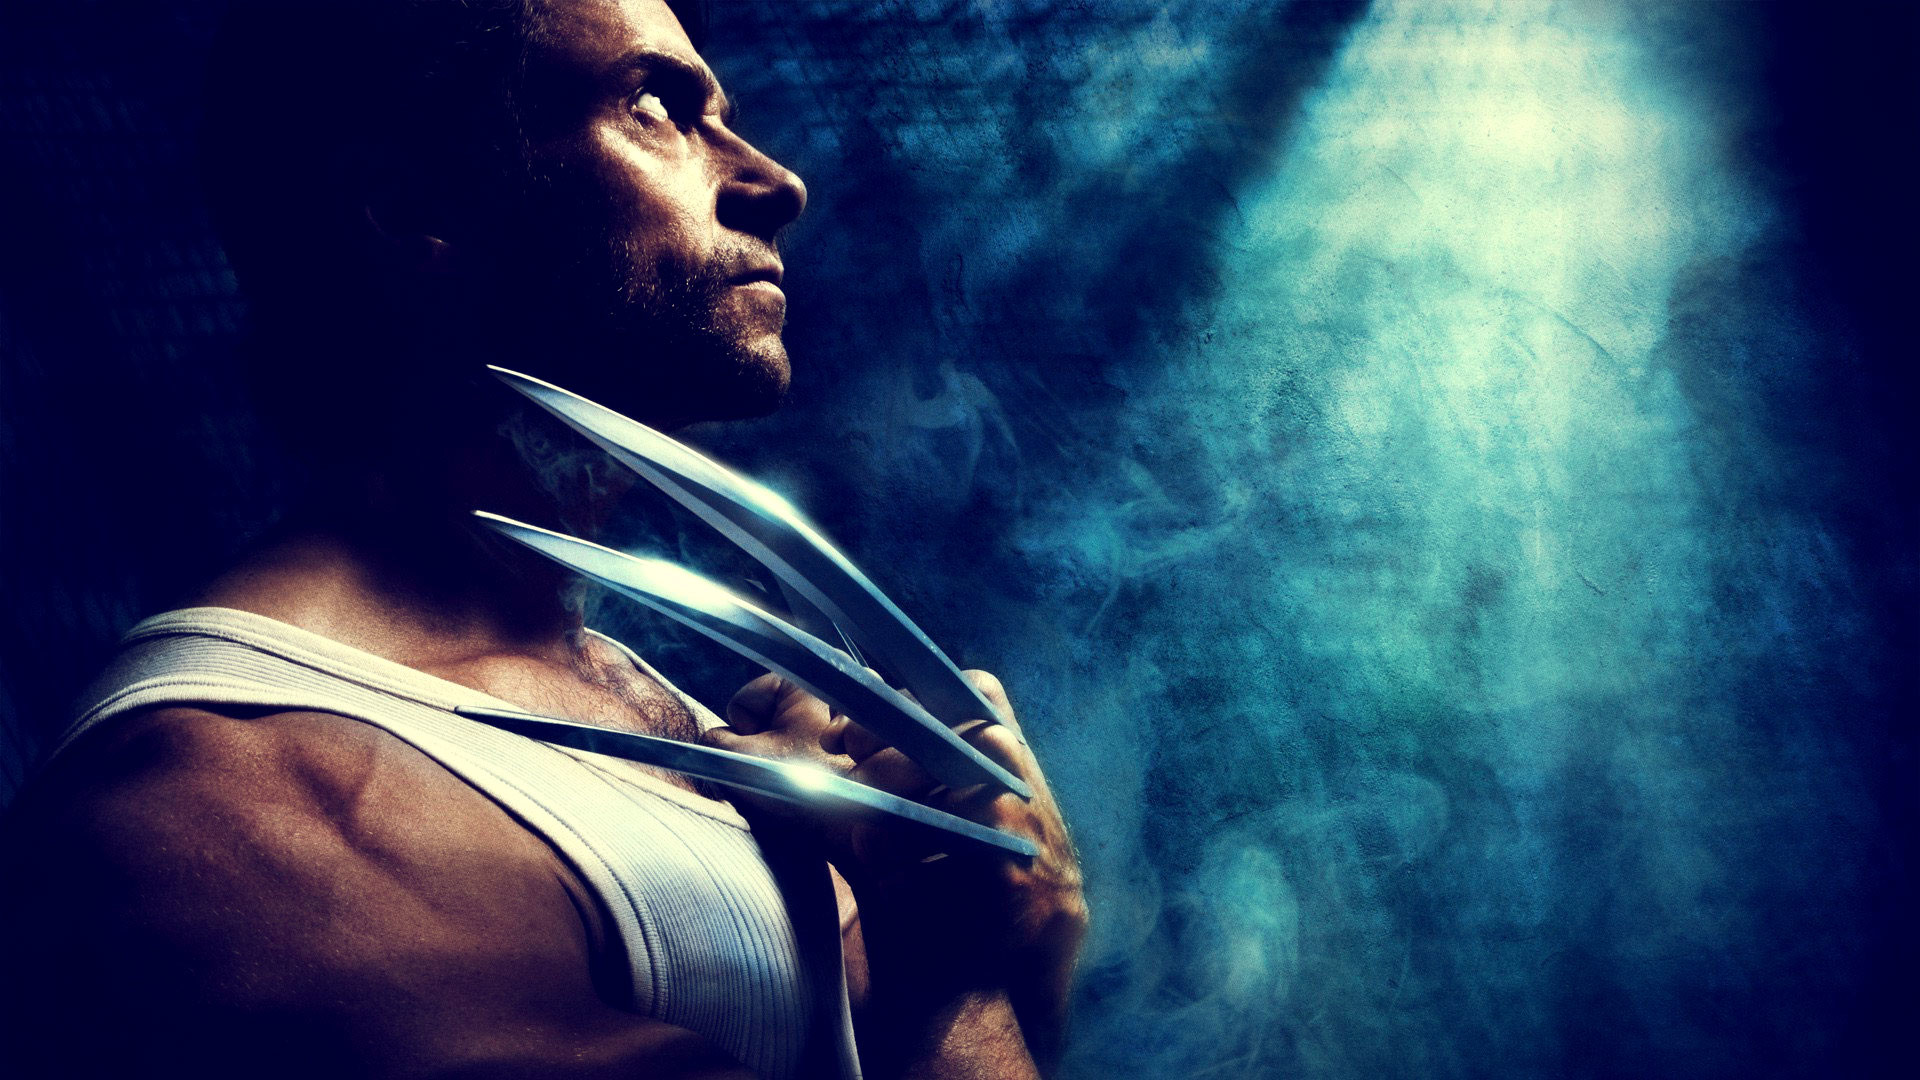 Hugh Jackman Wolverine Wallpaper 71 Images